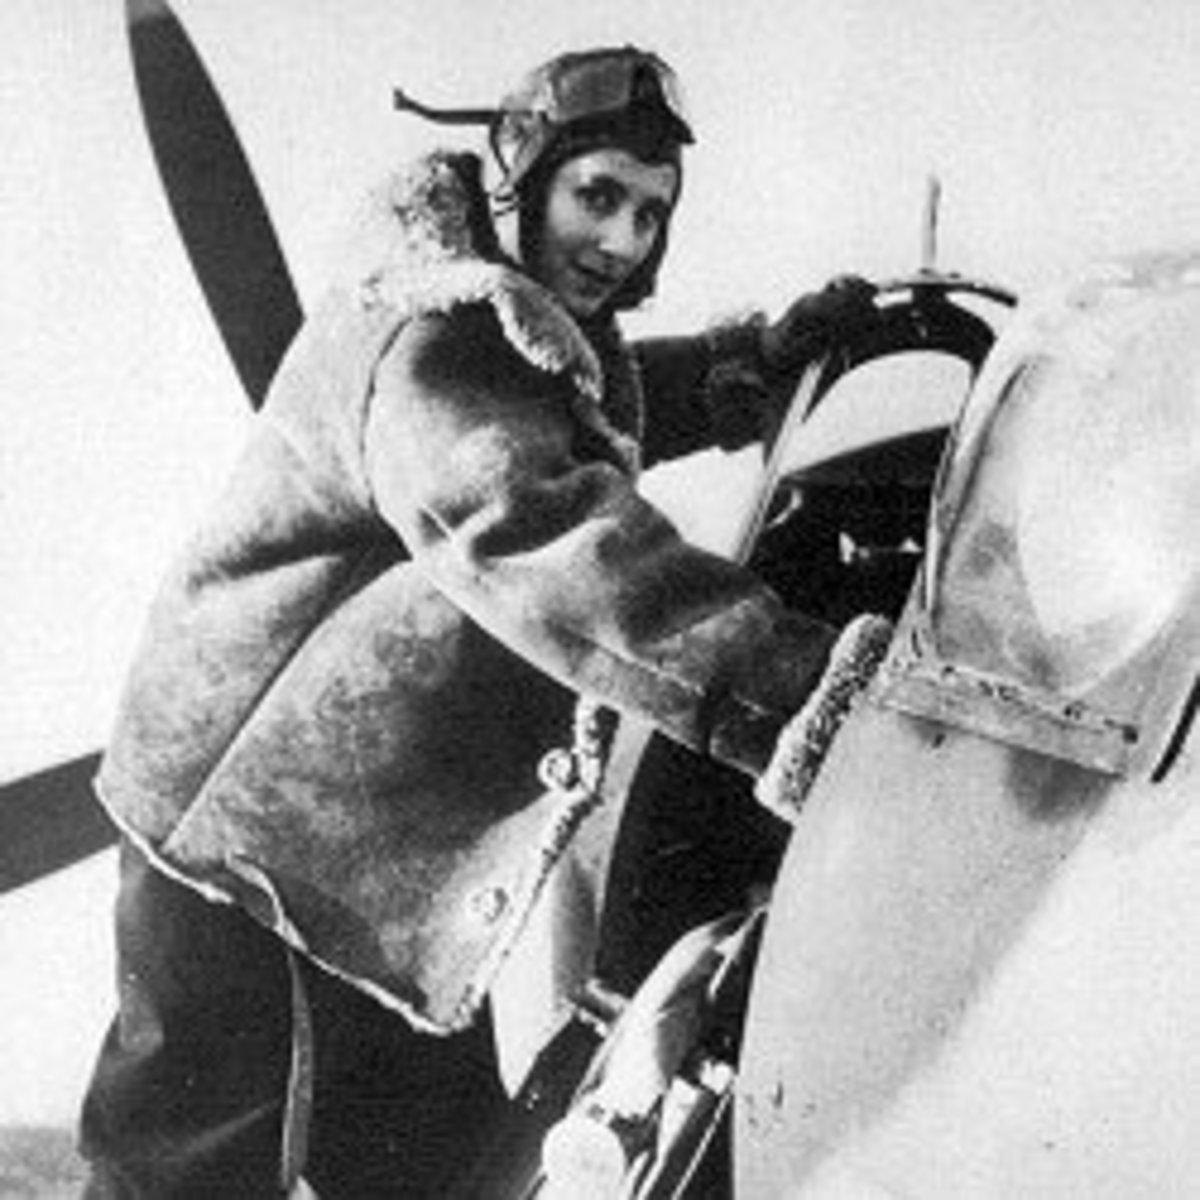 Diana Barnato Walker ferrying a Spitfire